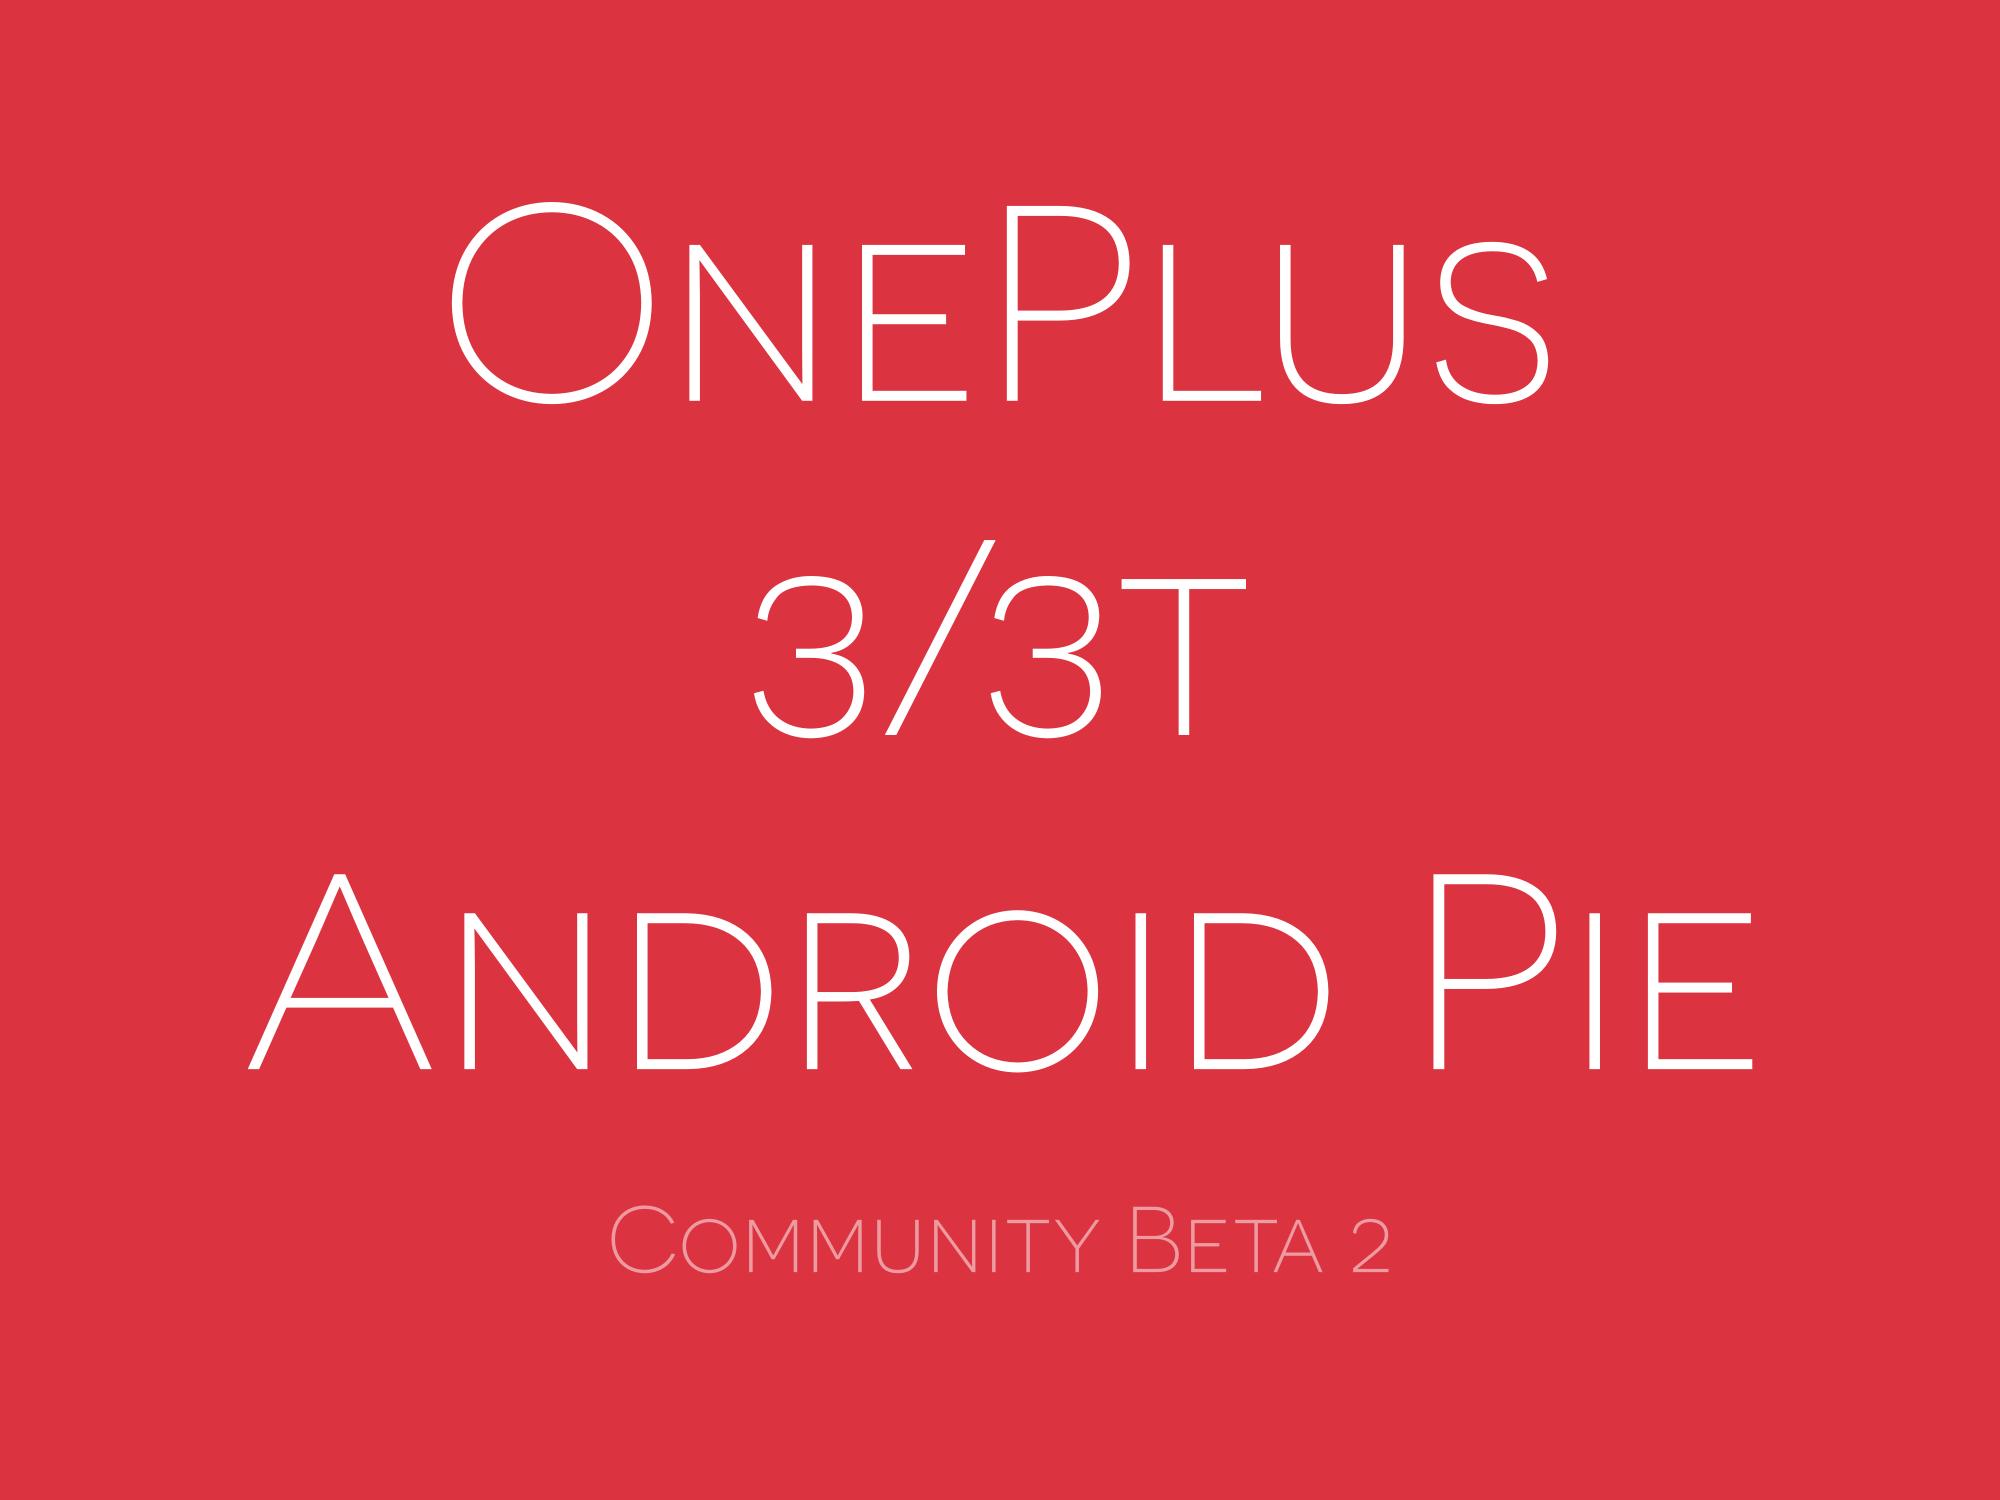 Android Pie community beta 2